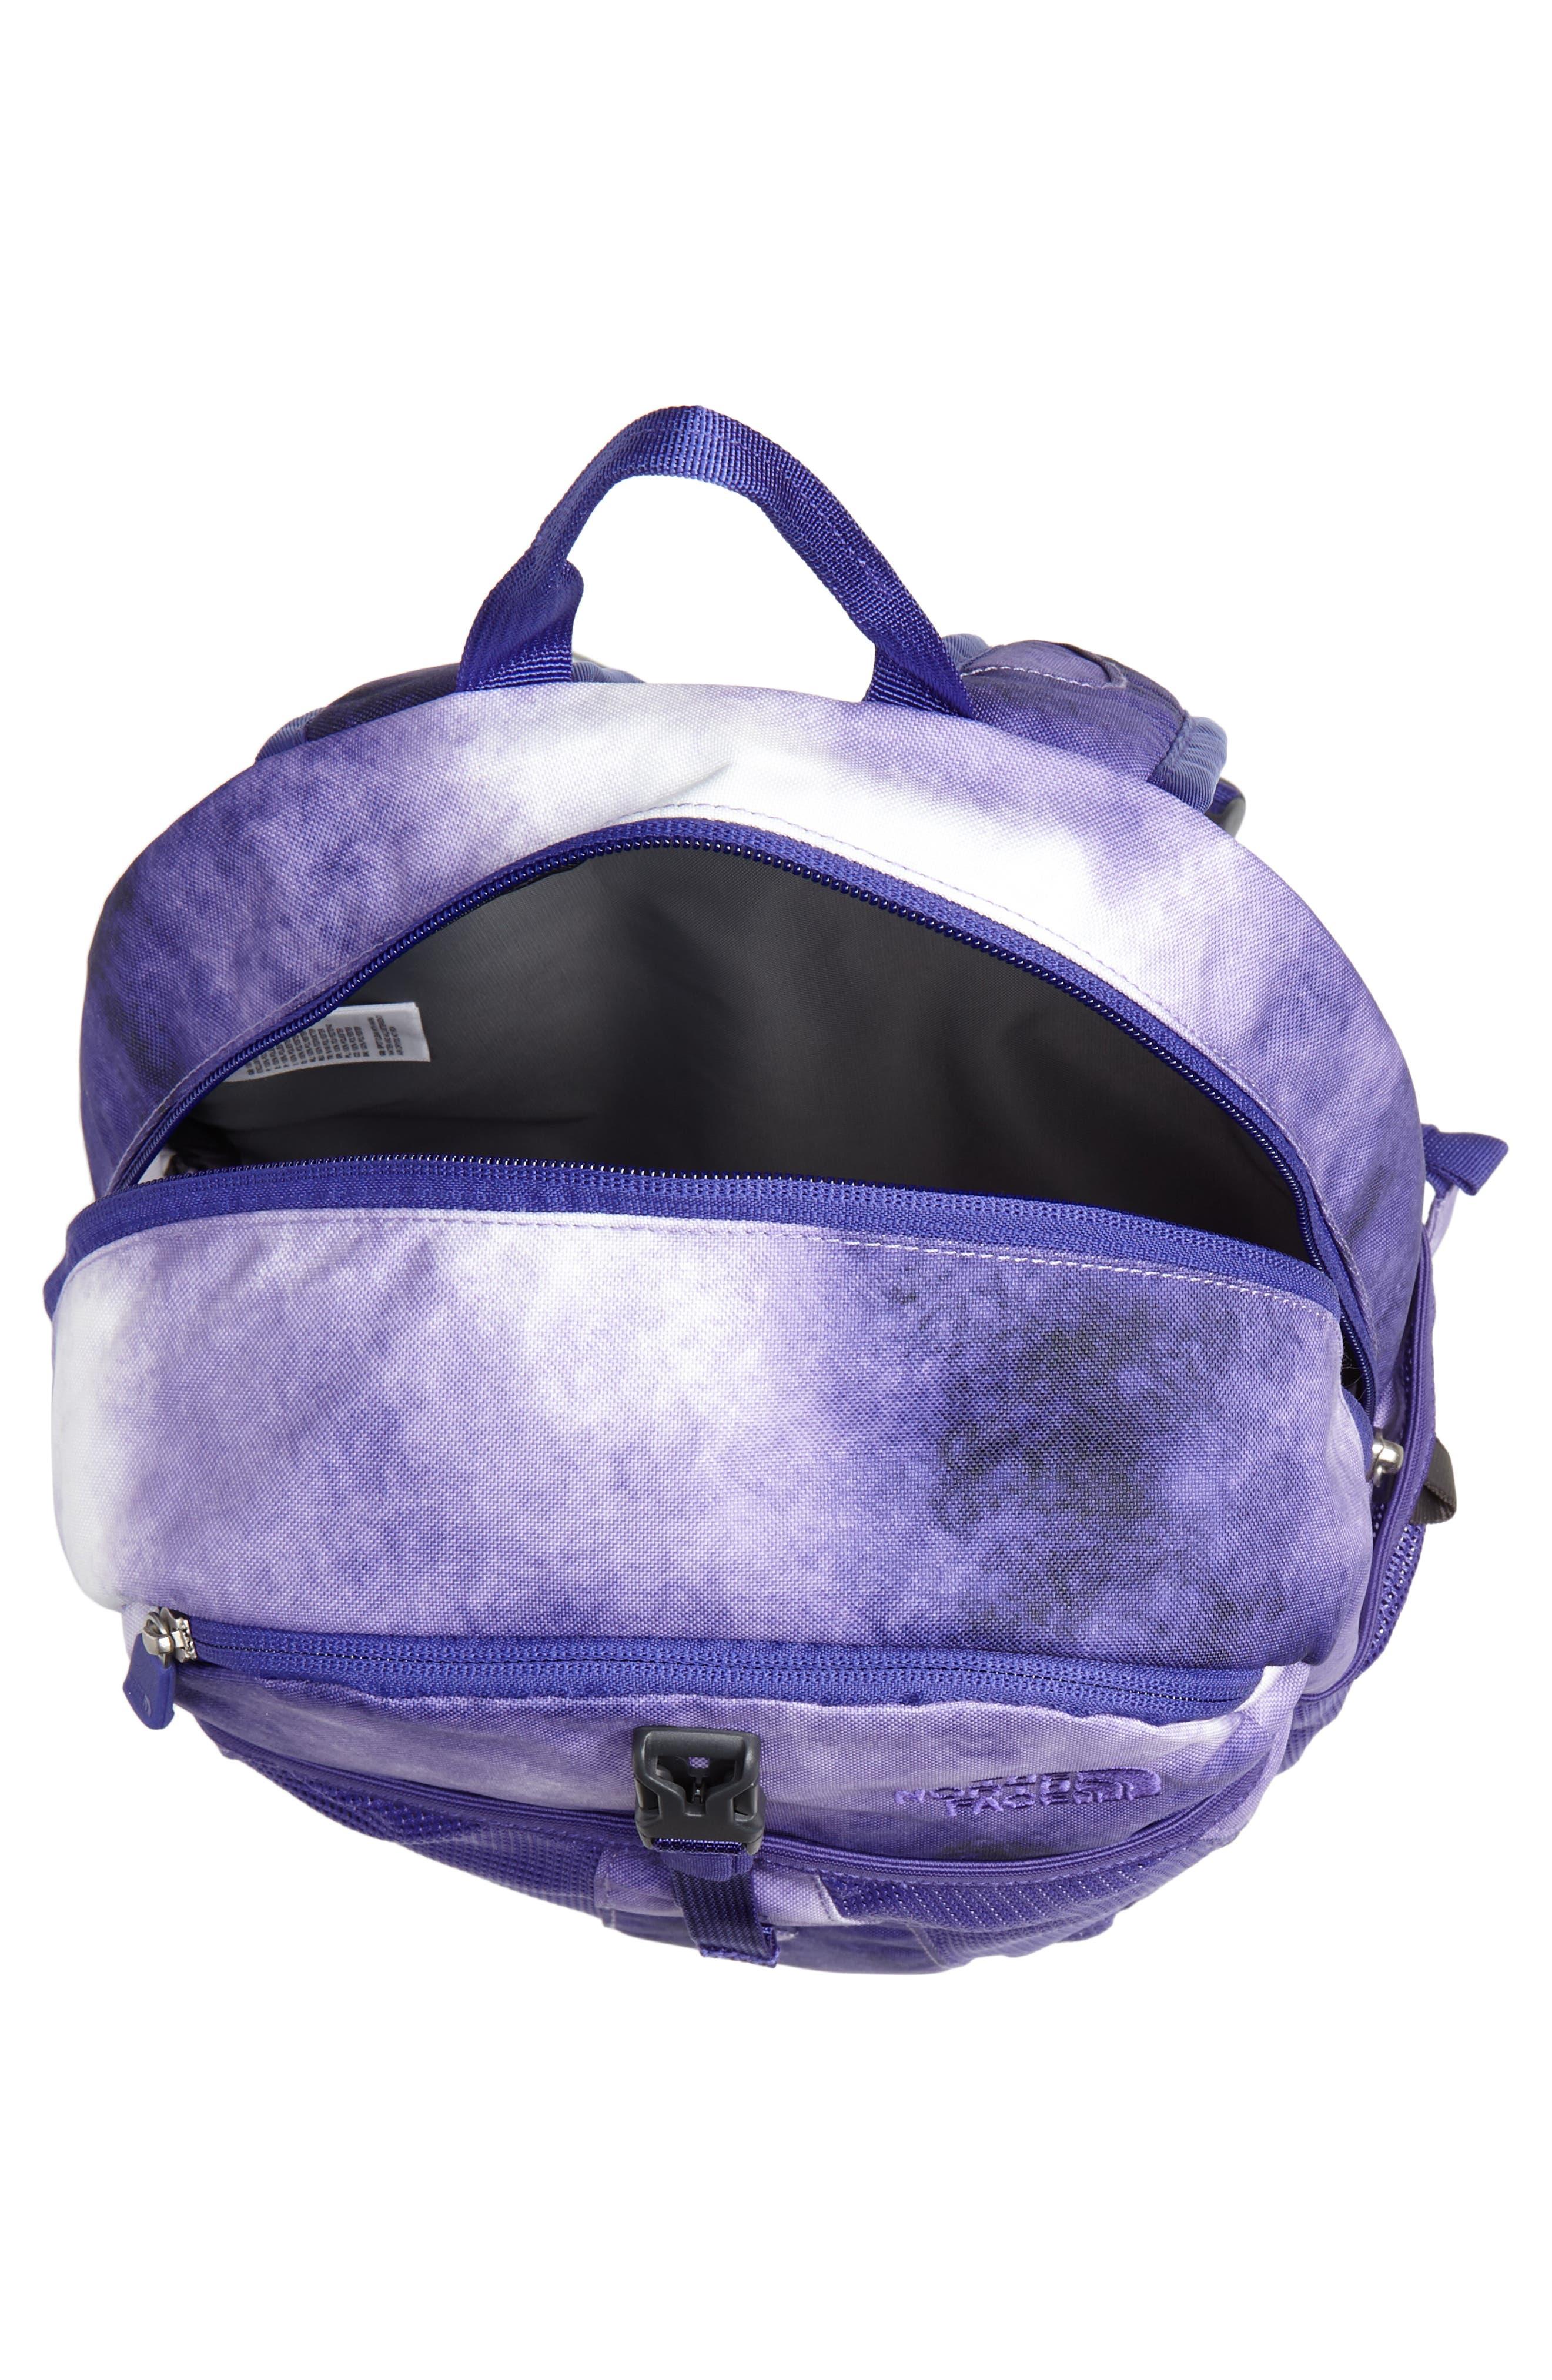 Recon Squash Backpack,                             Alternate thumbnail 3, color,                             501